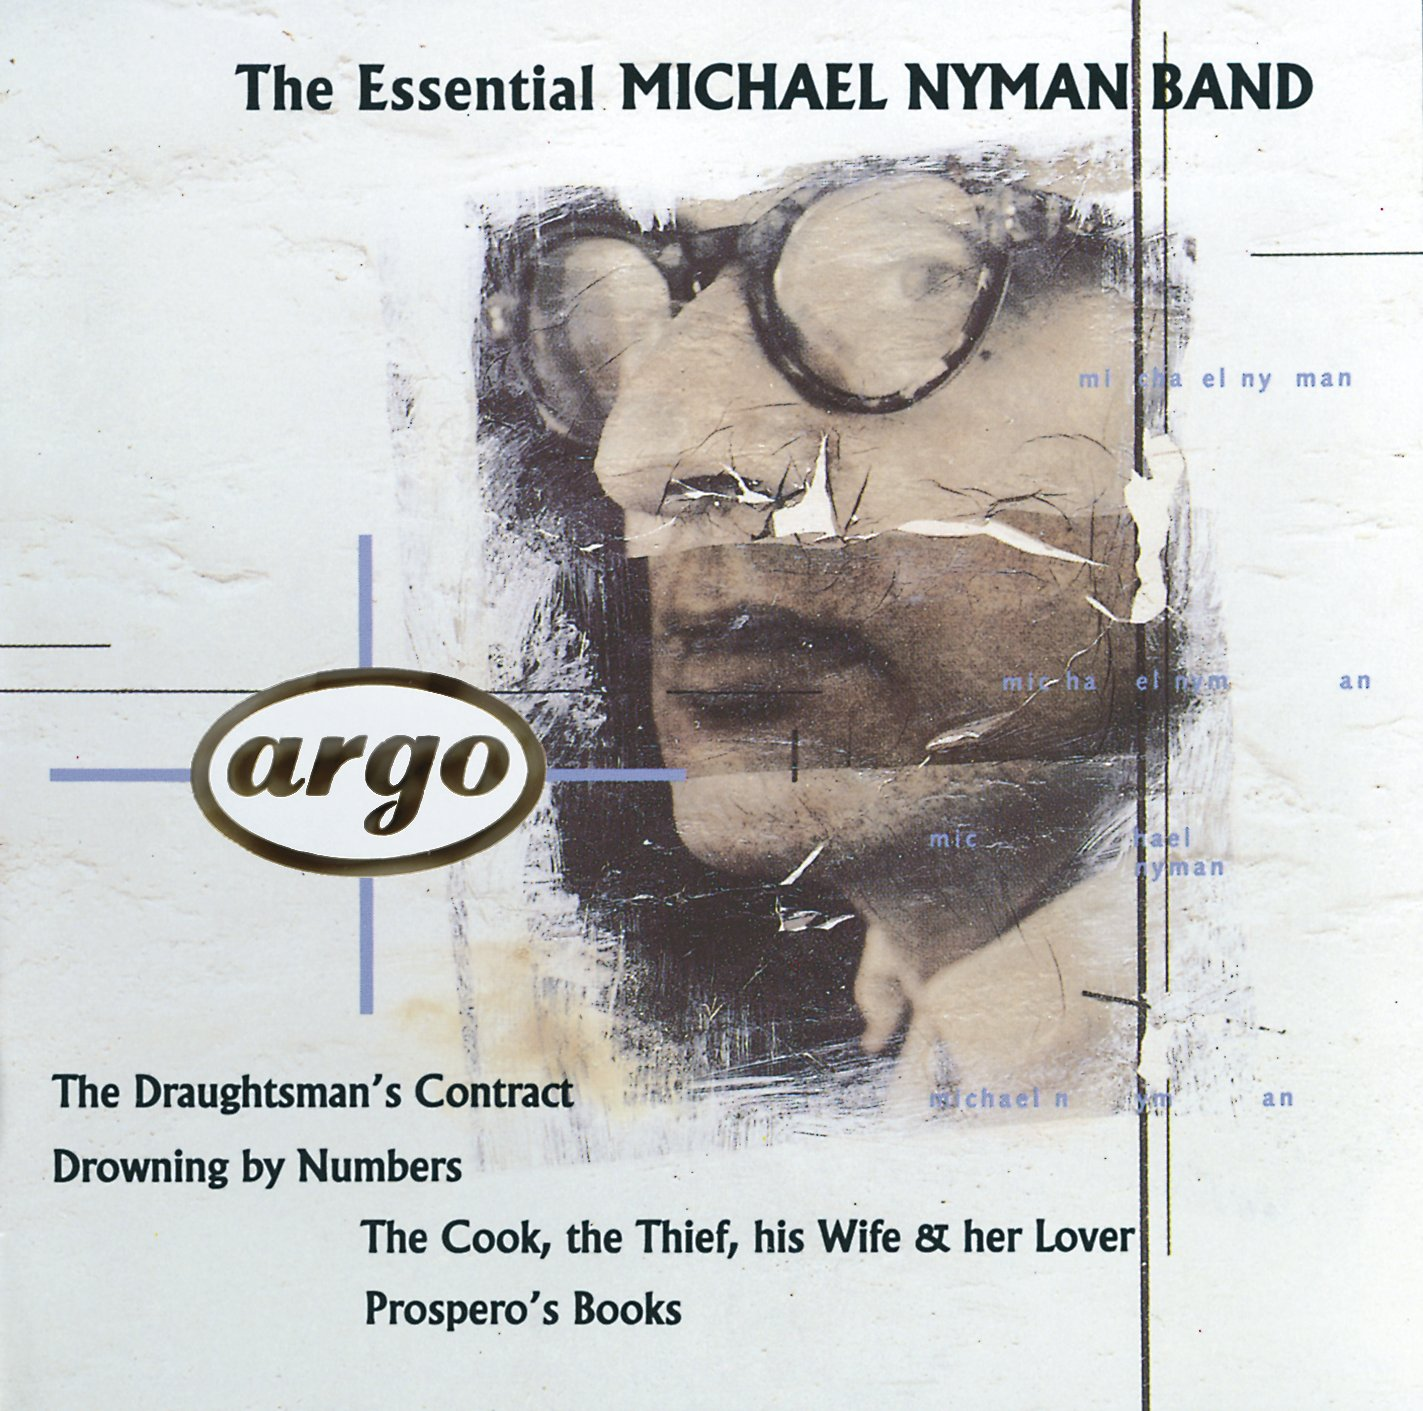 Michael Nyman Band – The Essential (1992) [FLAC]